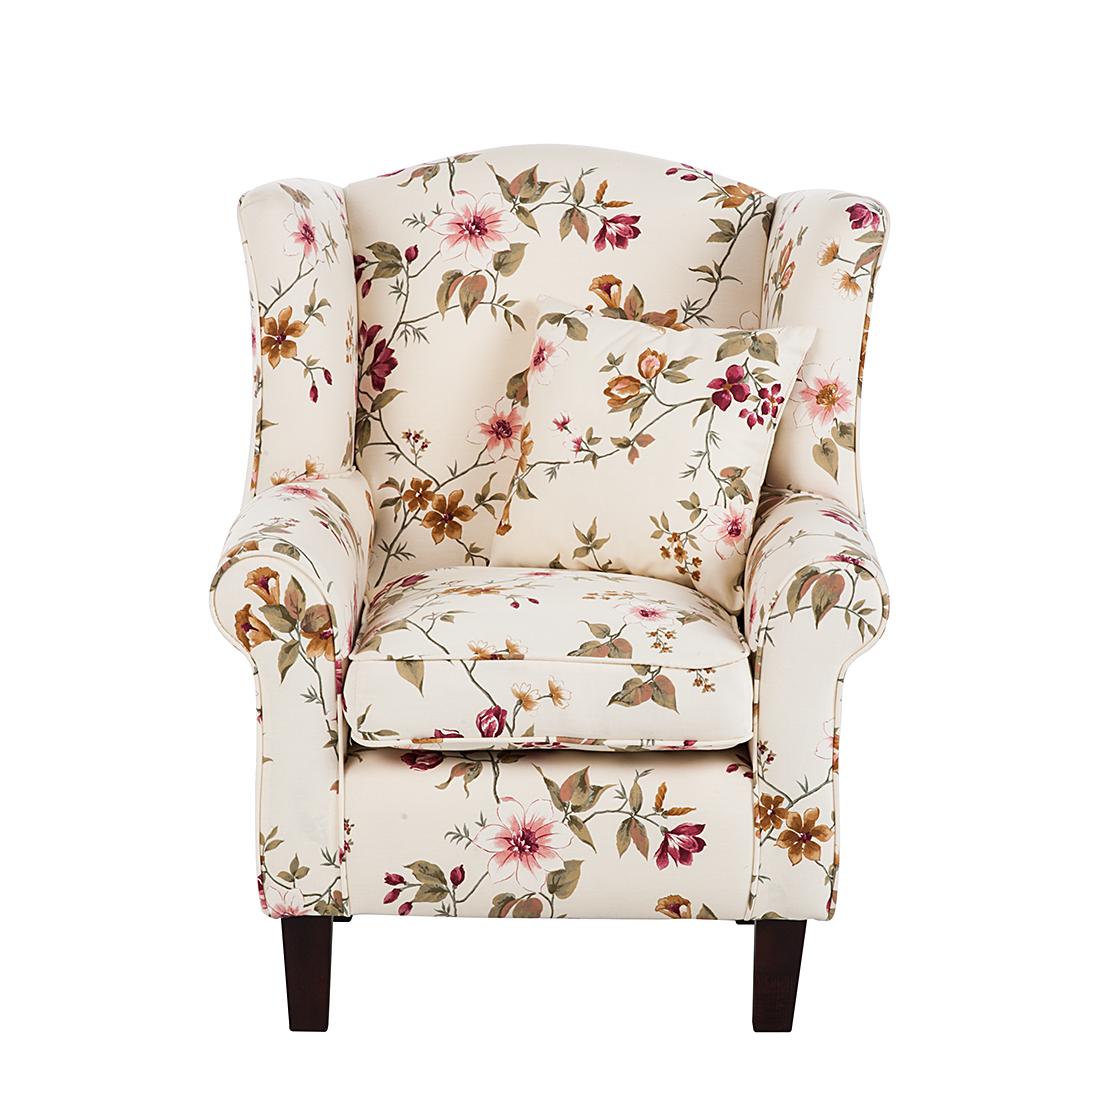 ohrensessel hocker beige blumen fernsehsessel clubsessel sessel su hocker neu ebay. Black Bedroom Furniture Sets. Home Design Ideas